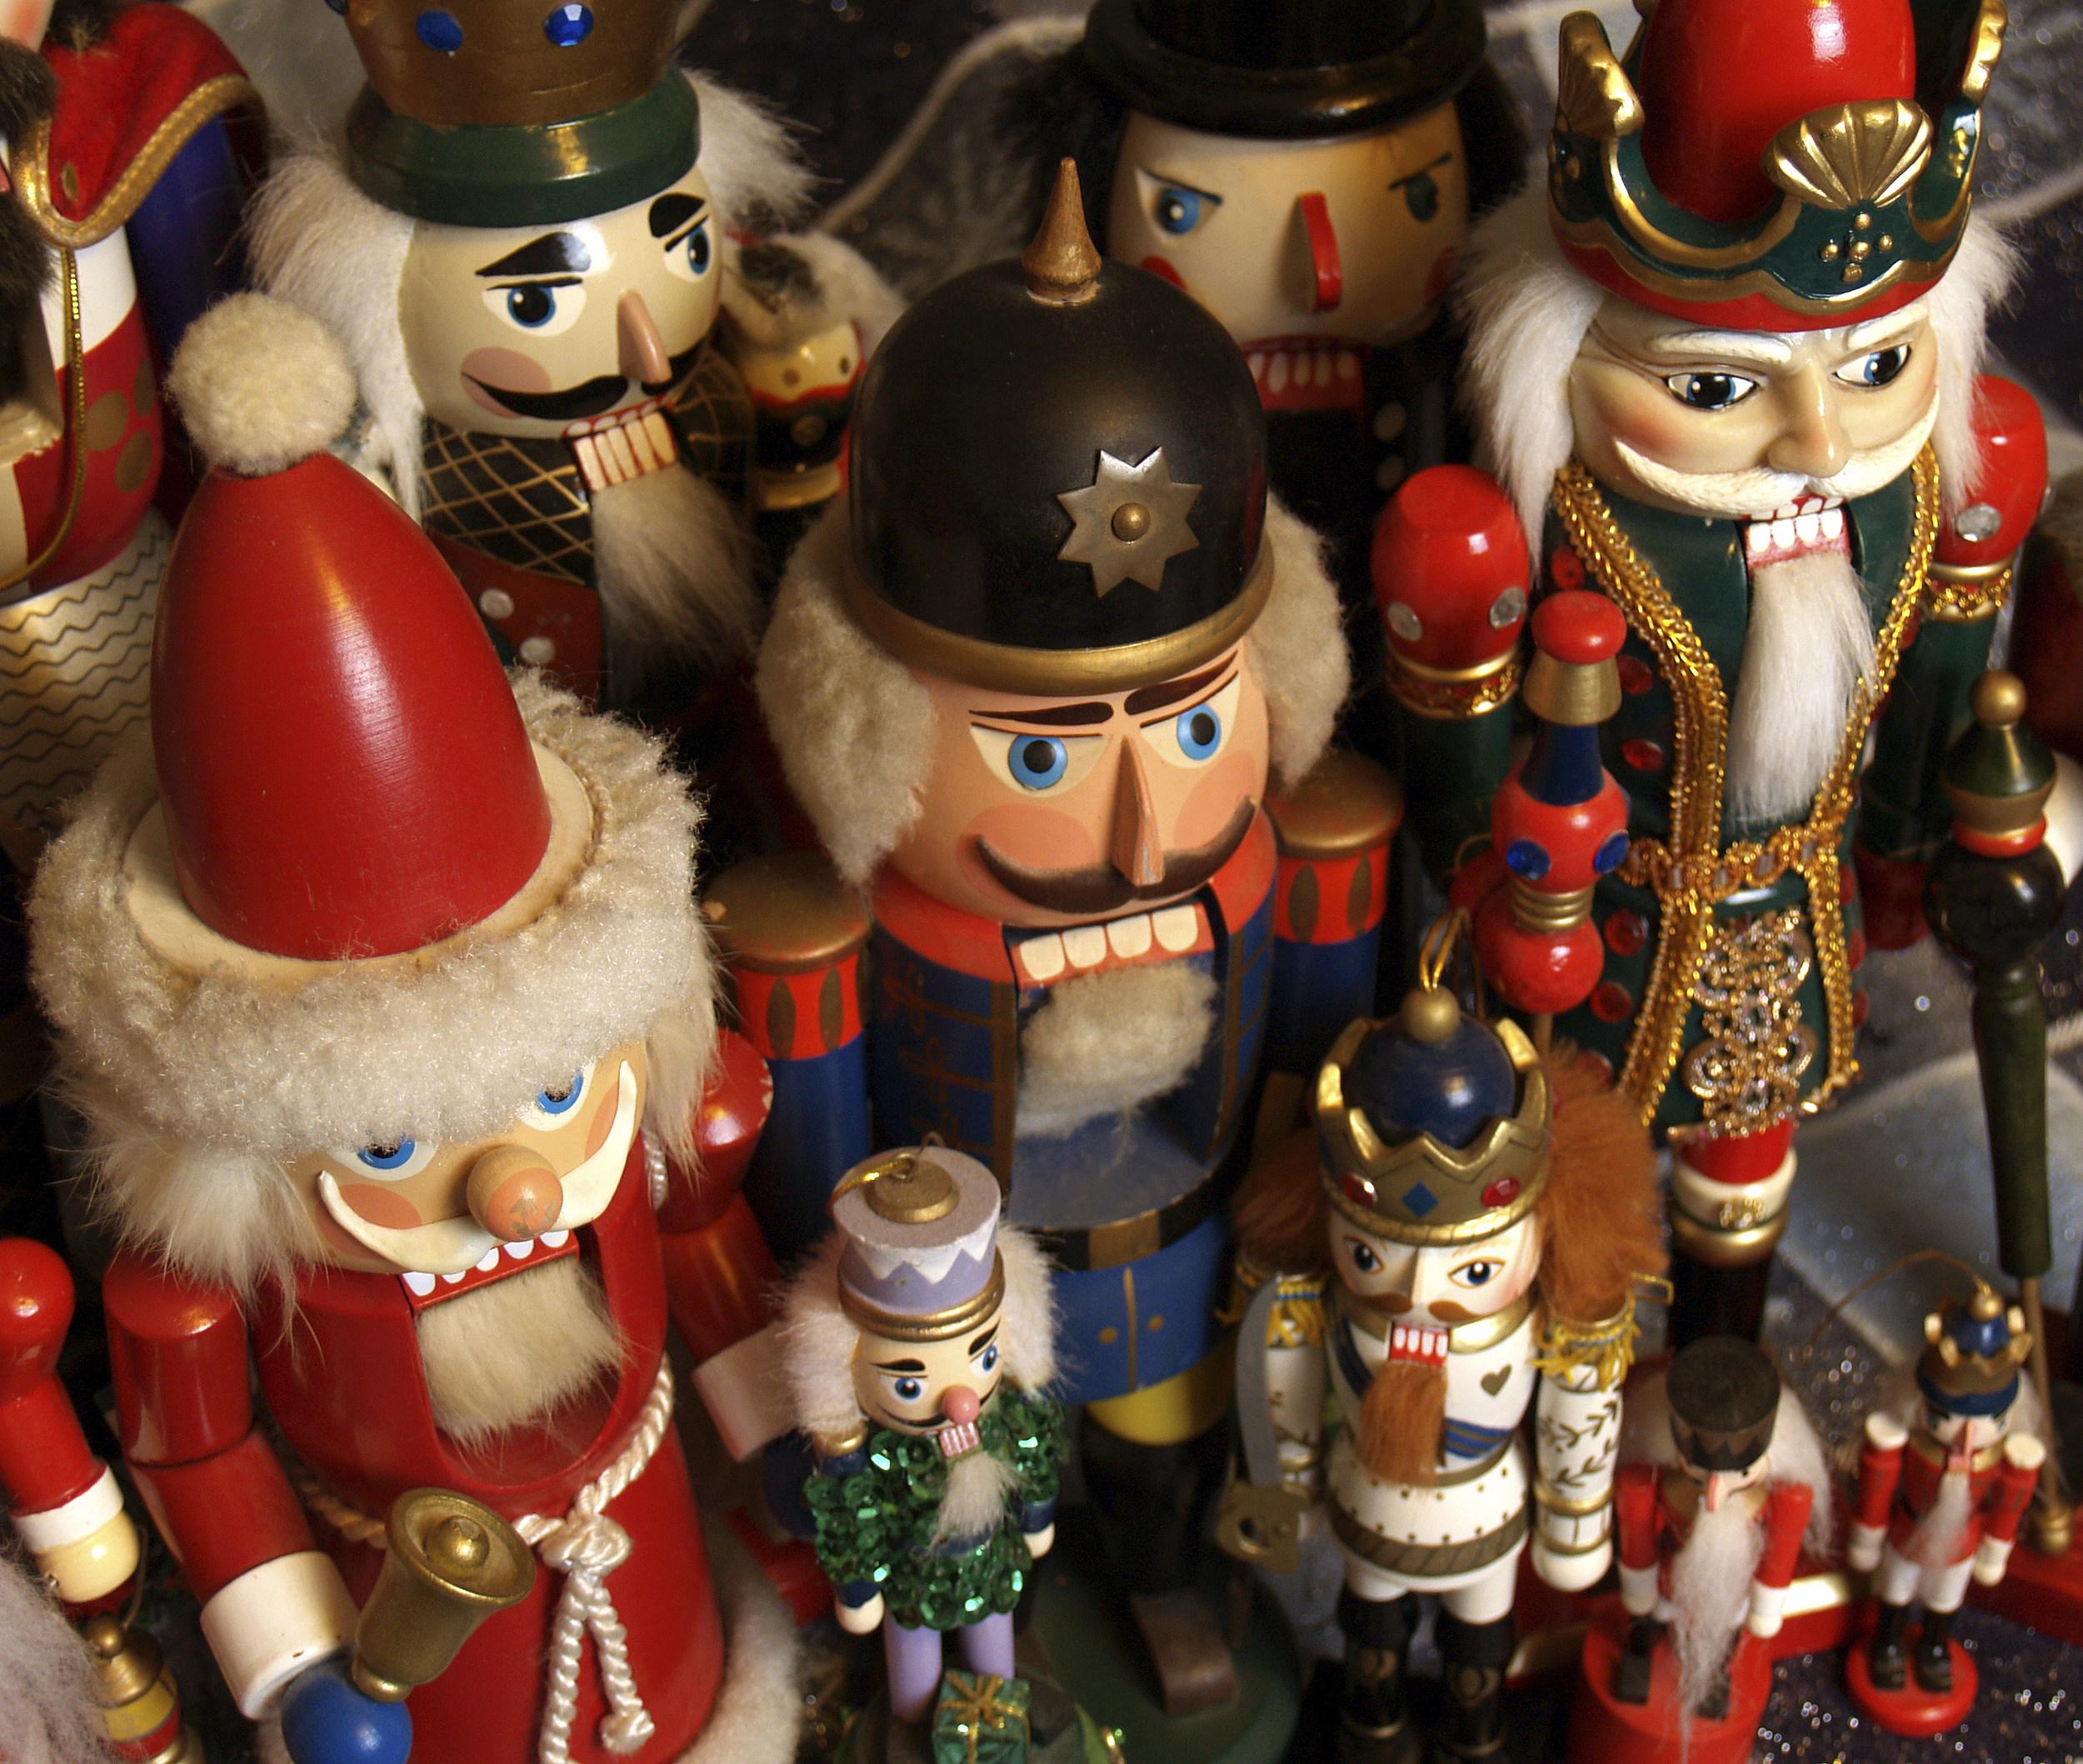 Christmas Traditions at Frederik Meijer Gardens Begins November 24